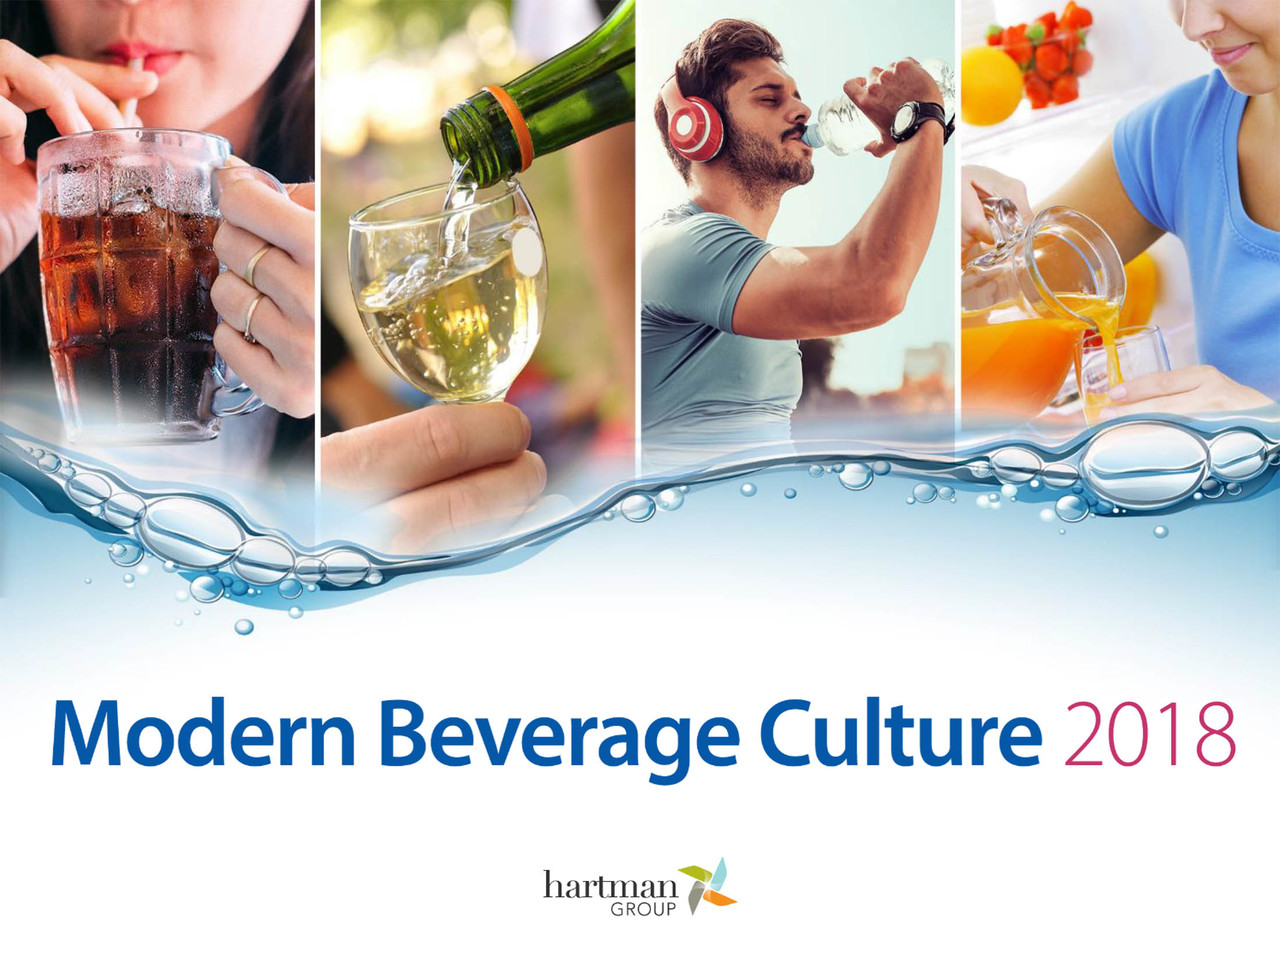 Modern Beverage Culture 2018